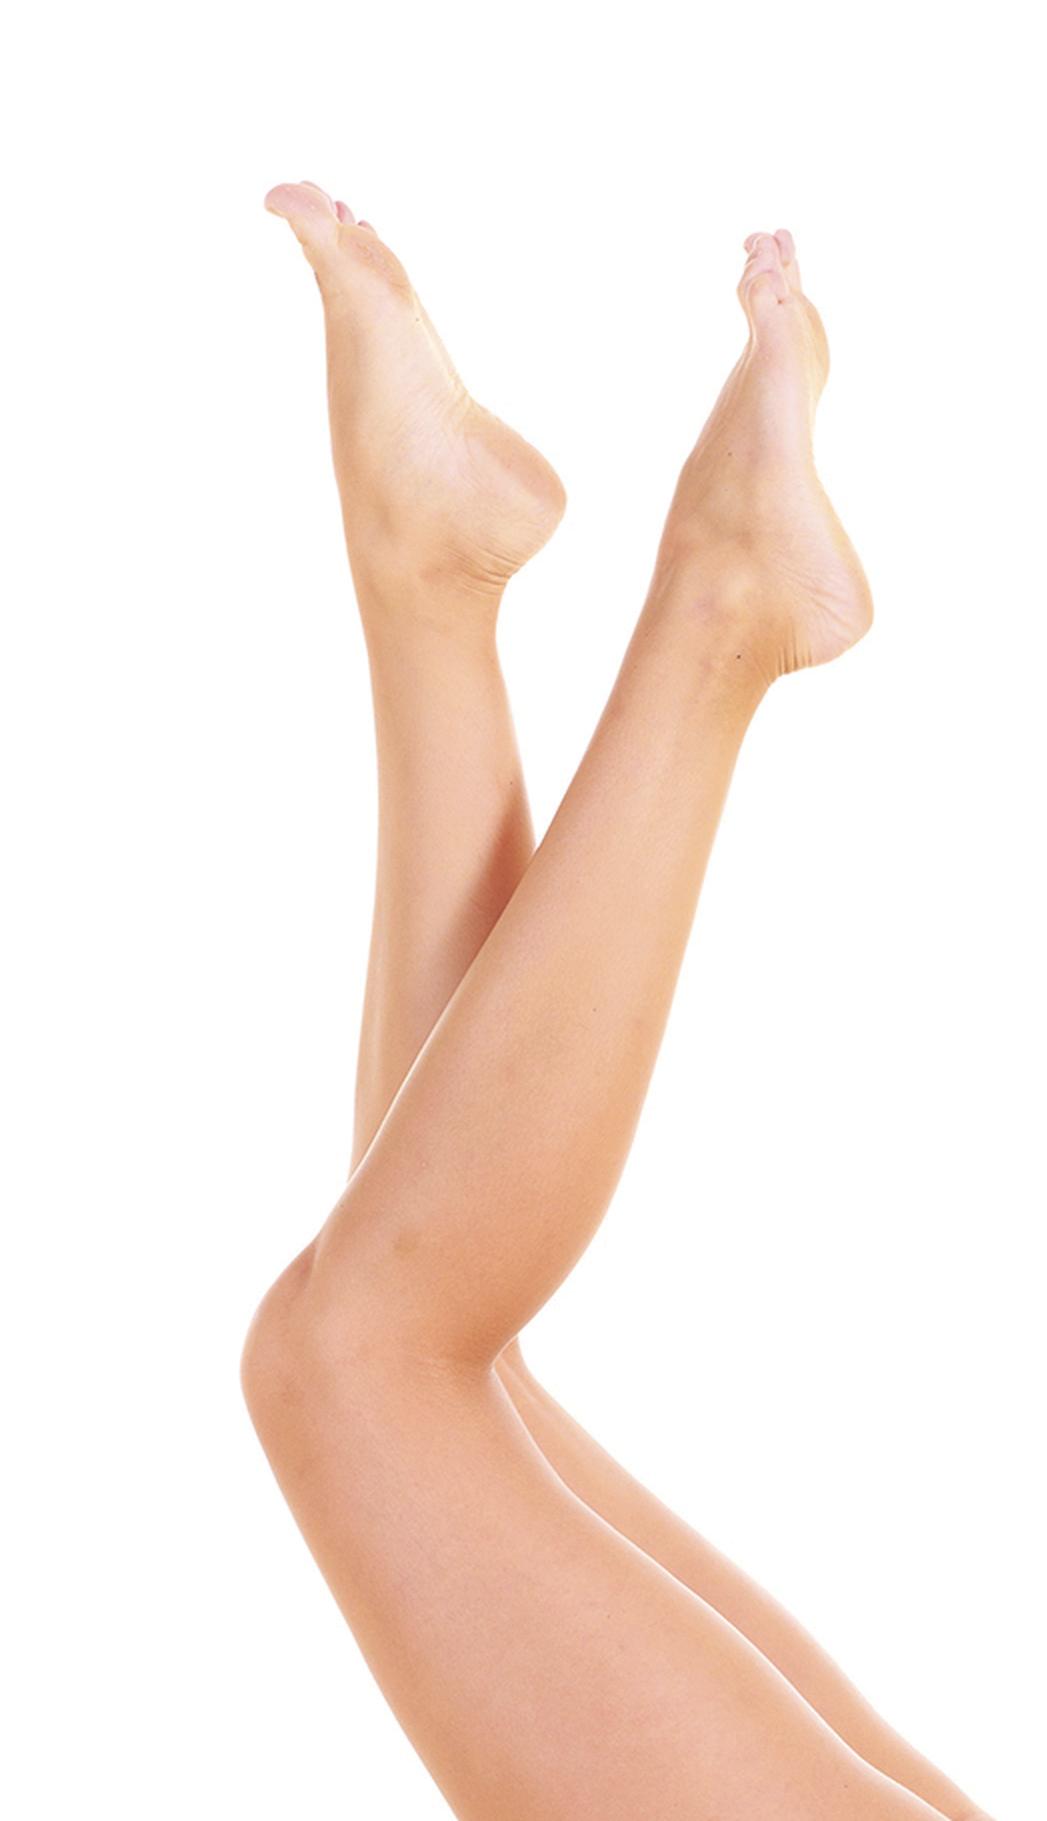 Hand clipart hip. Women legs png image